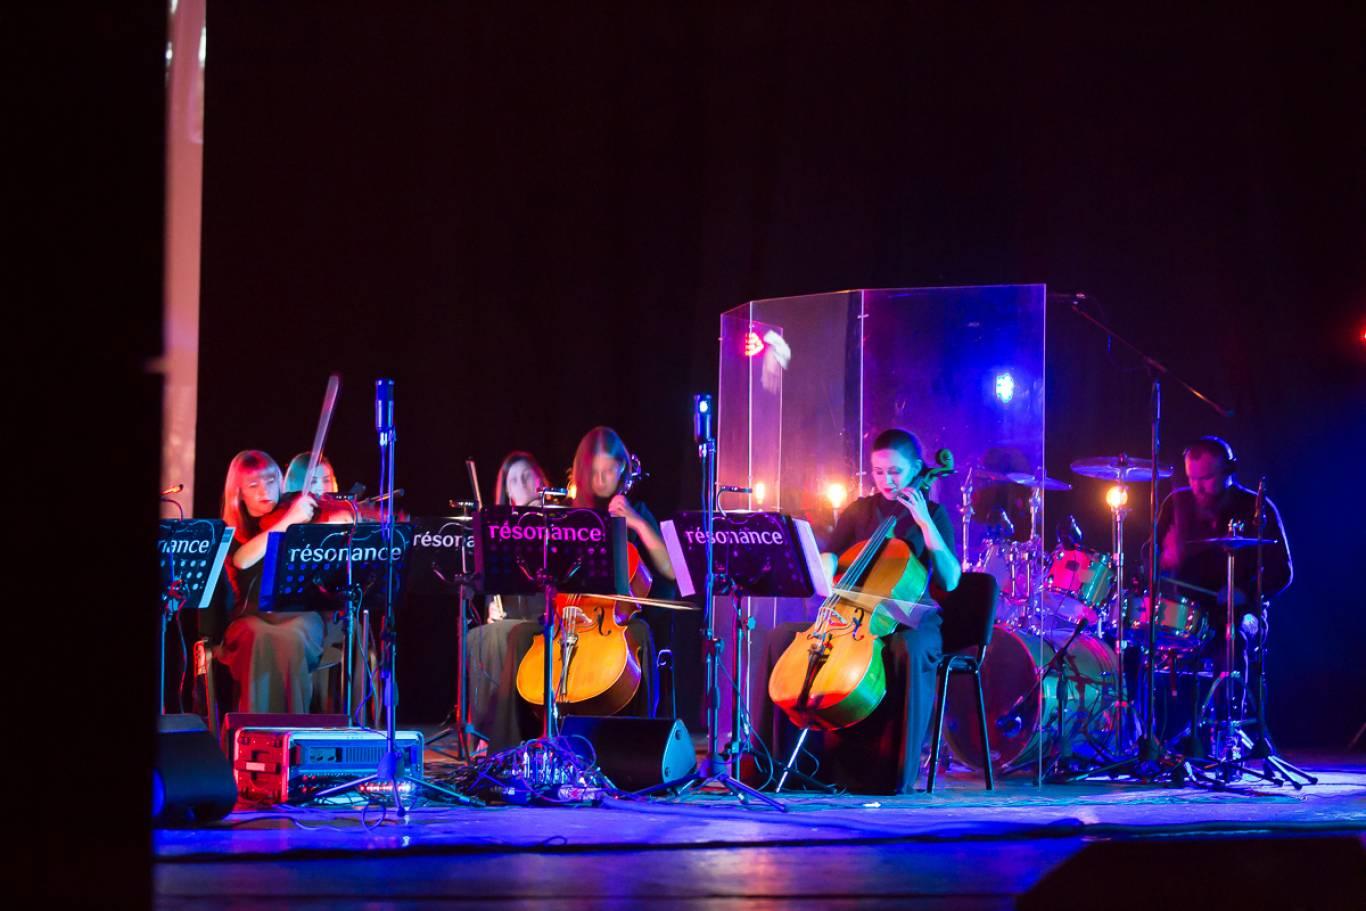 Концерт Группа «resonance», Пятилетие оркестра